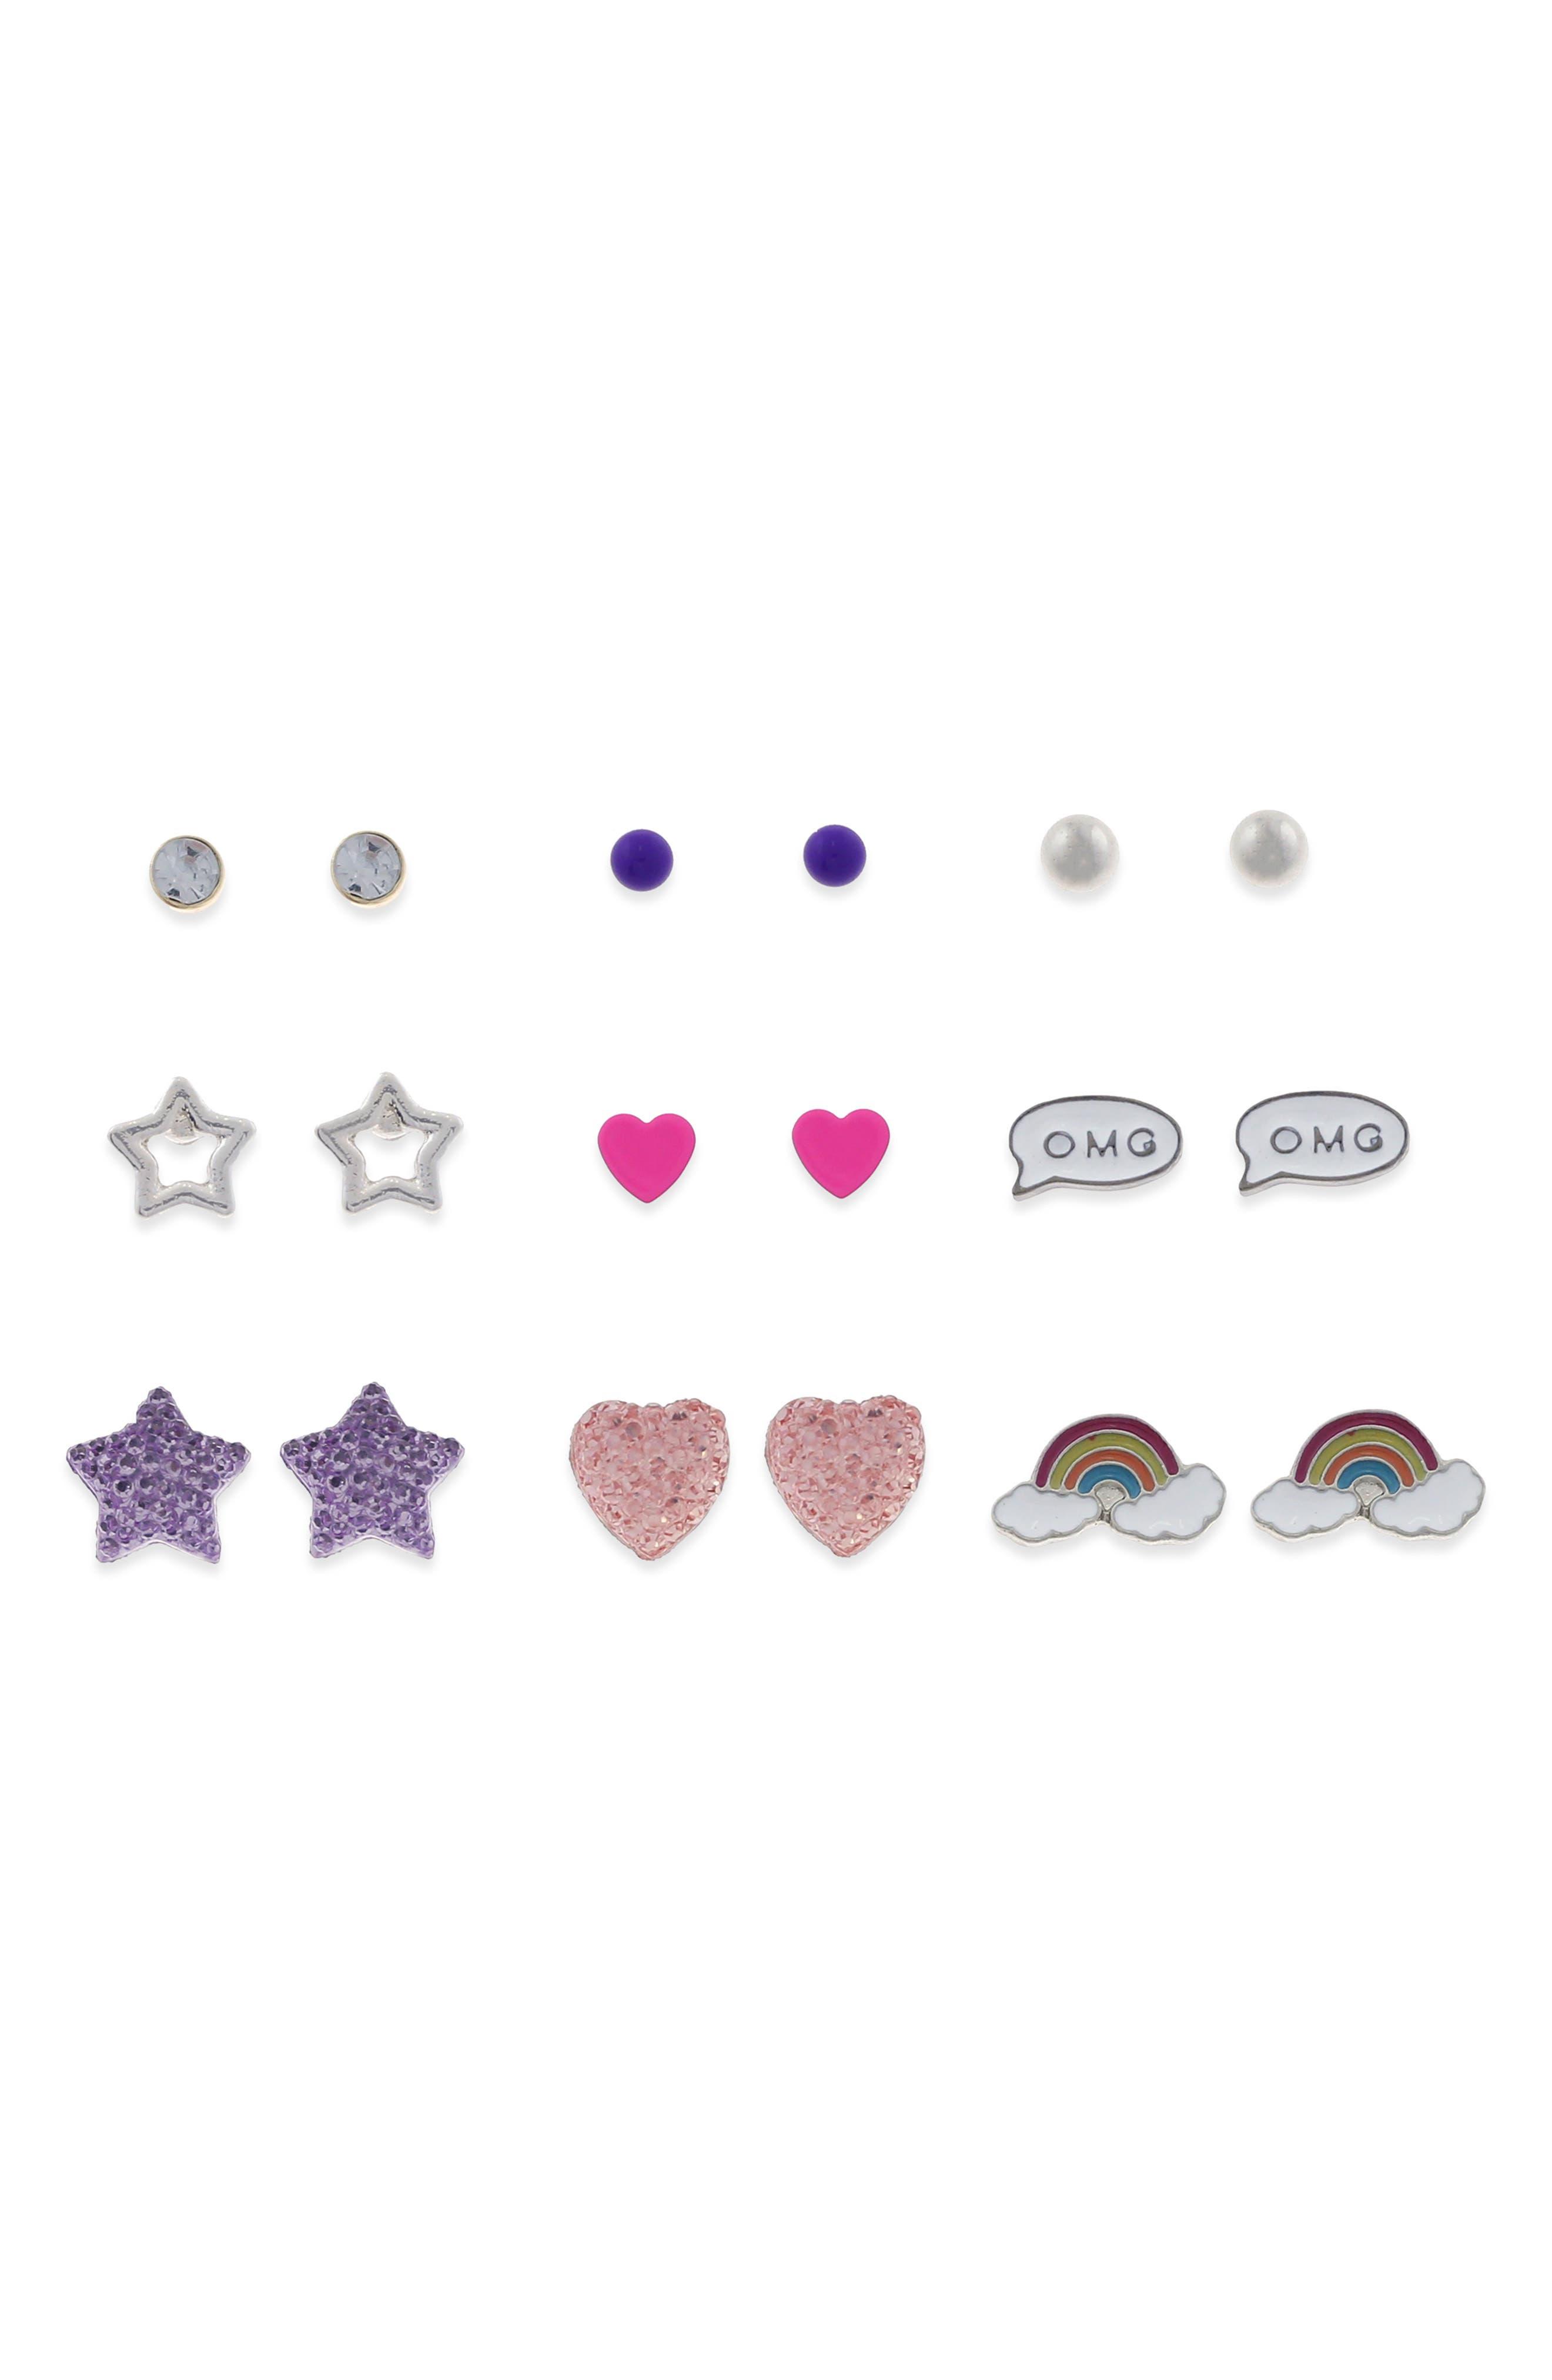 9-Pack Stud Earrings,                             Main thumbnail 1, color,                             501